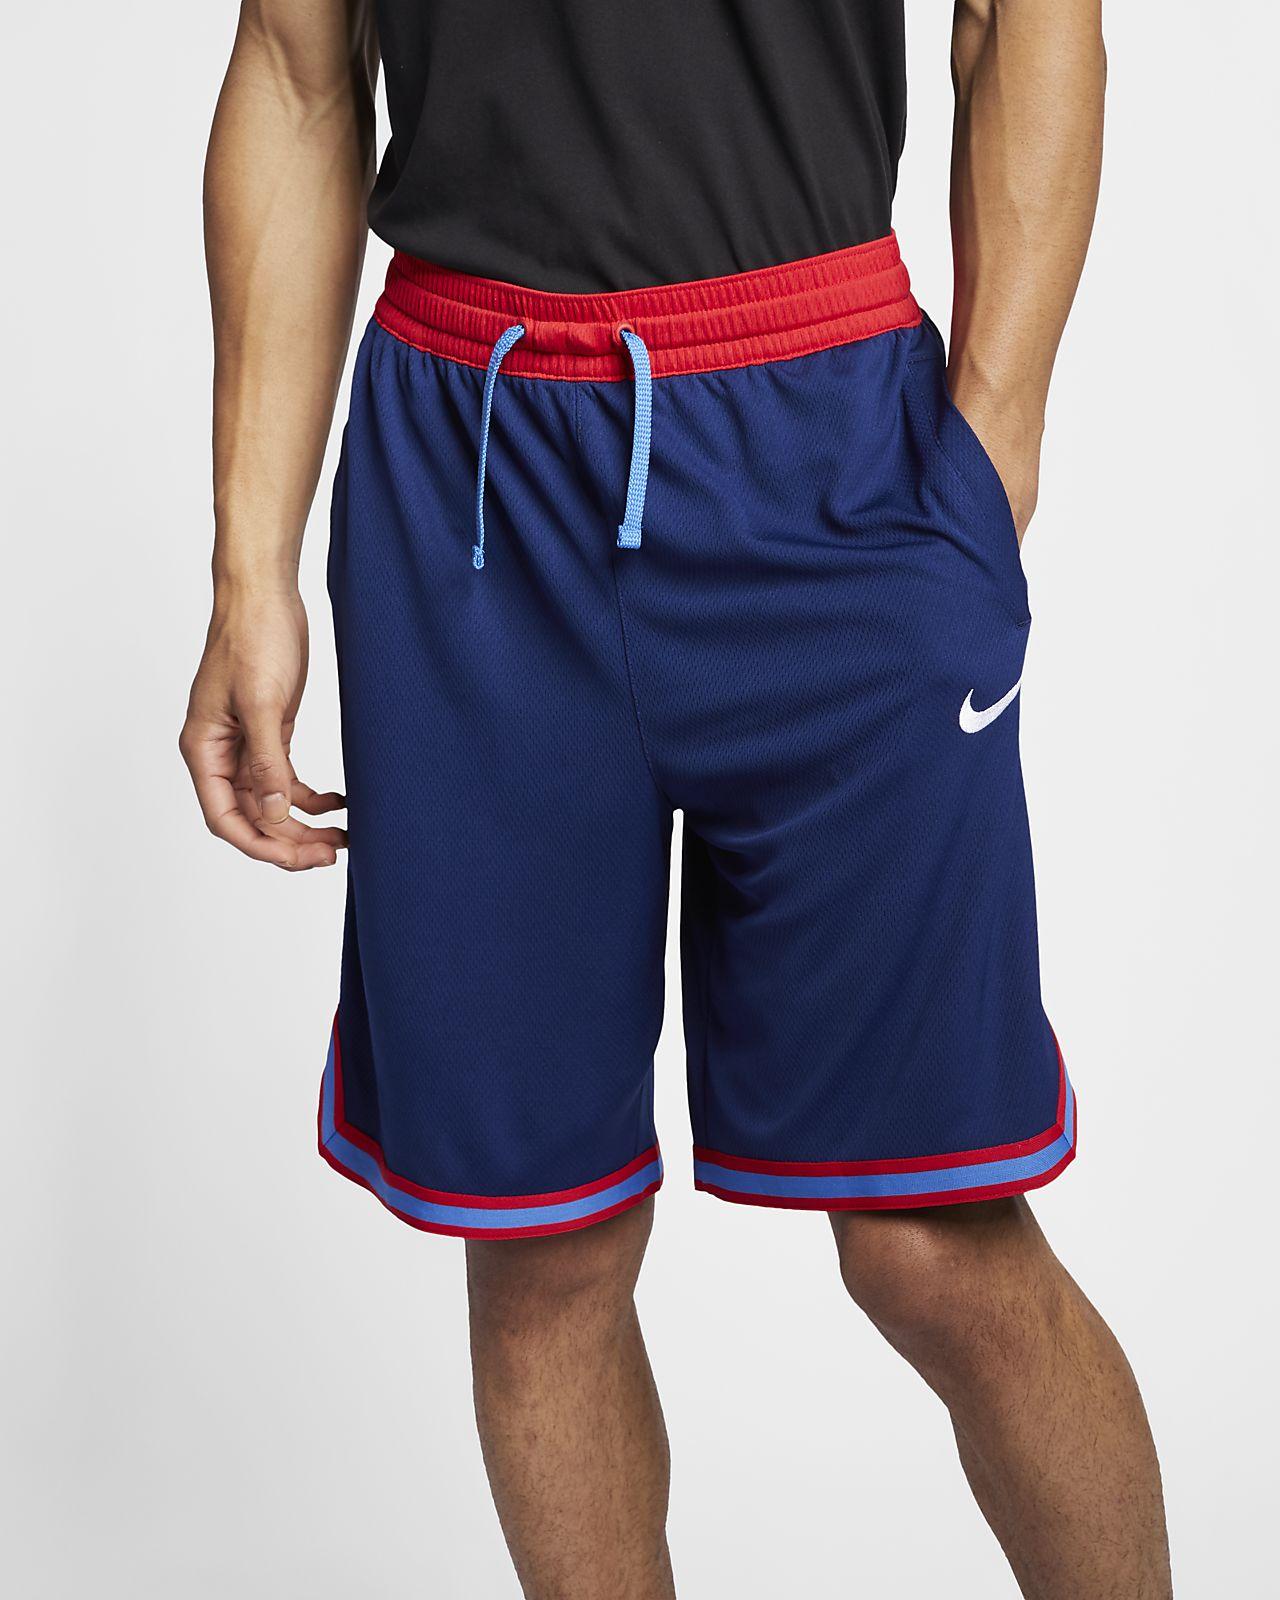 ff29185a38ad Nike Dri-FIT DNA Men s Basketball Shorts. Nike.com PT